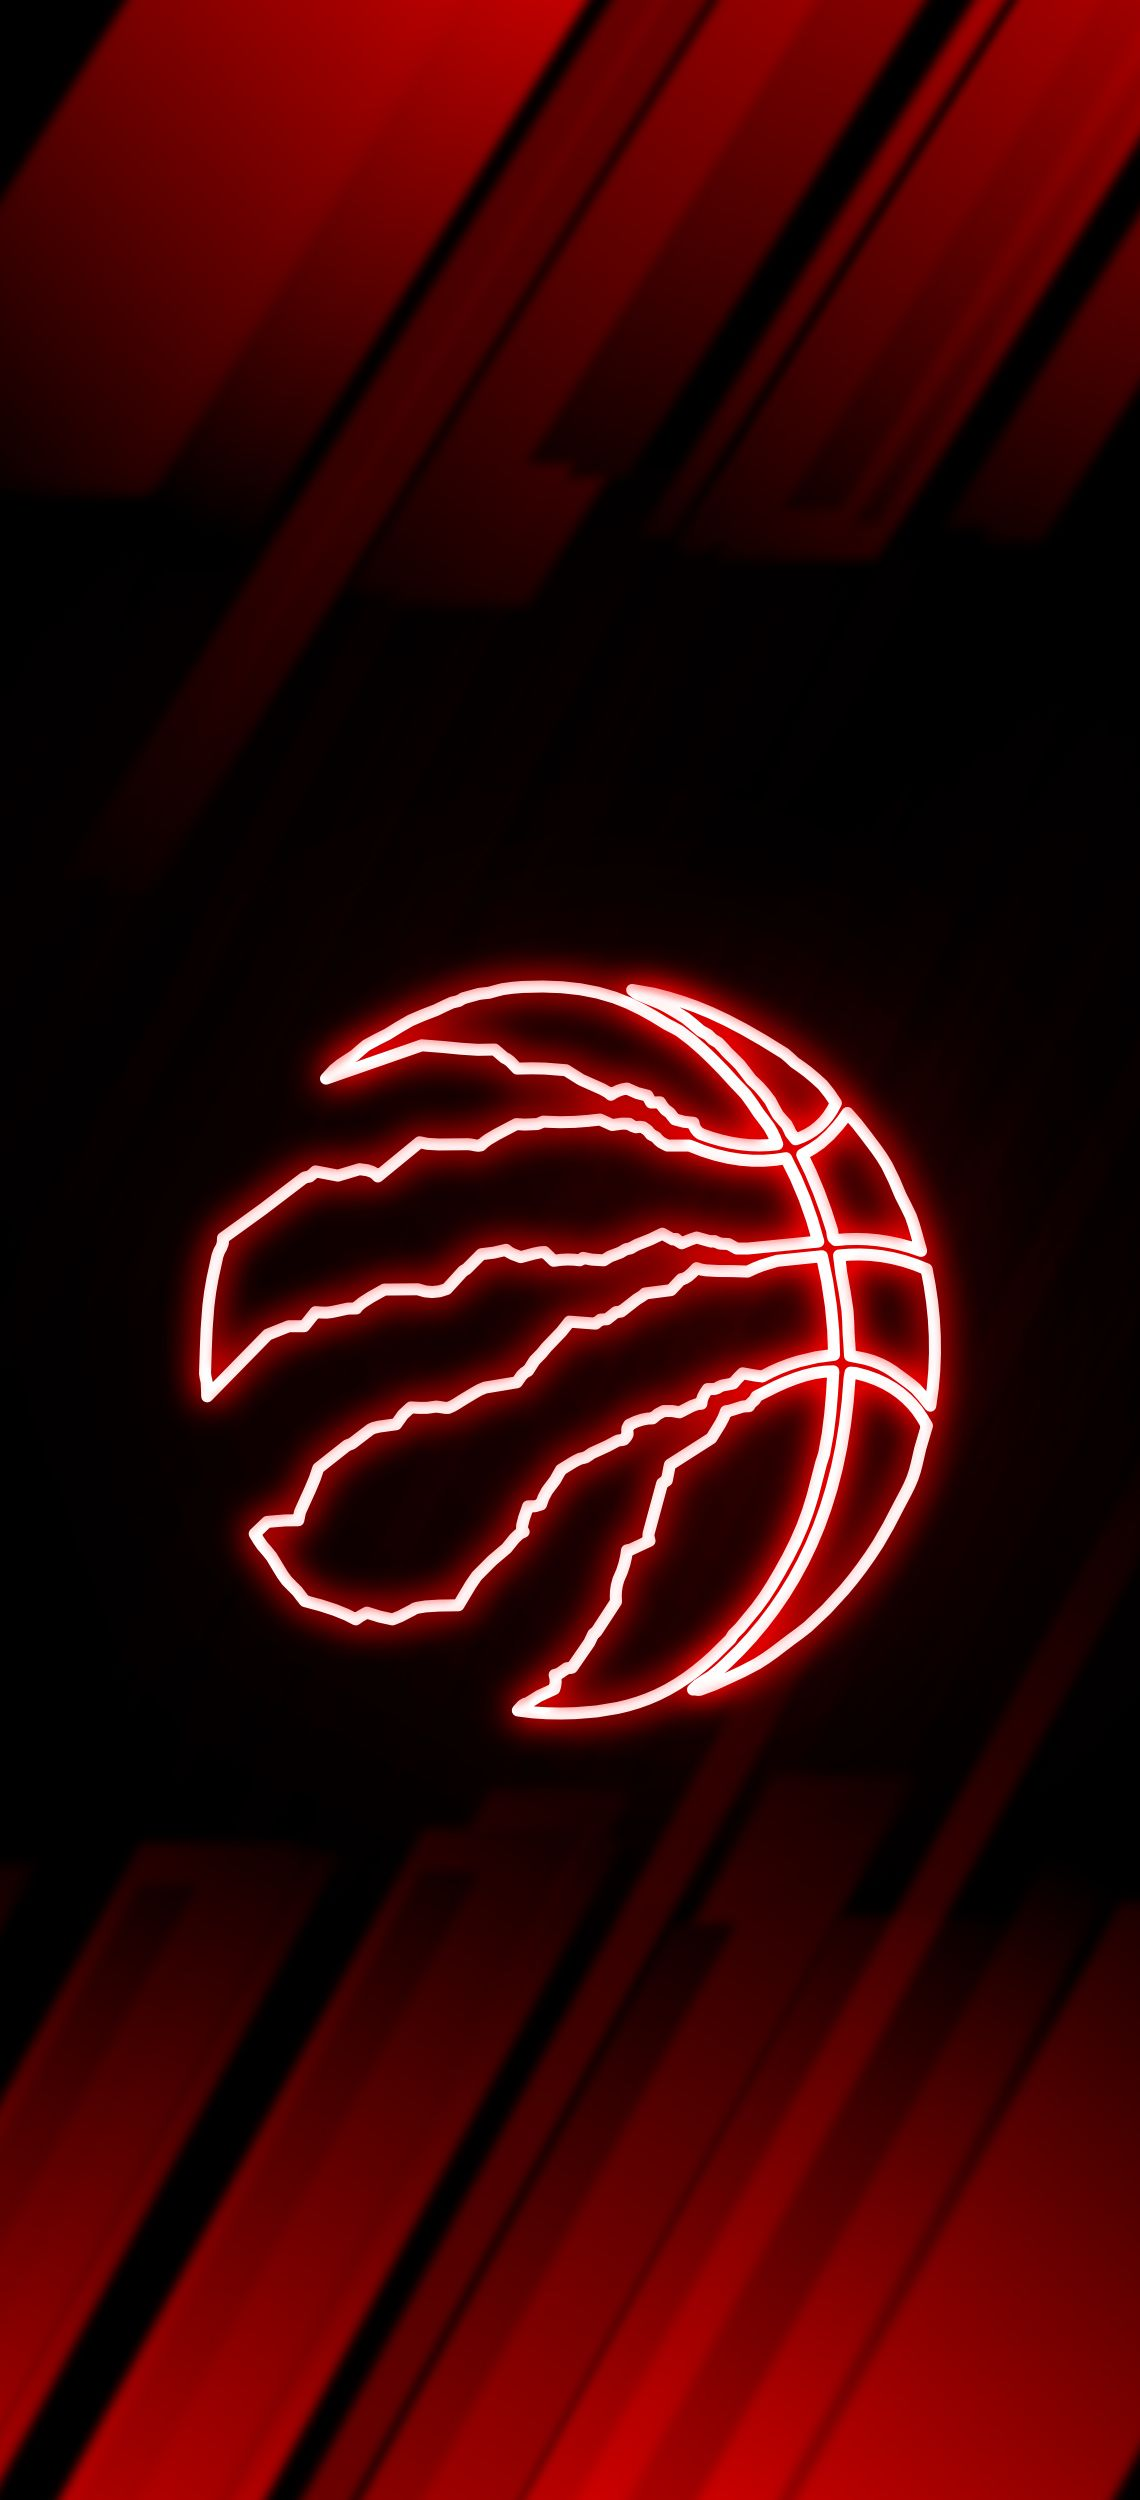 Sportsign Shop Redbubble Raptors Toronto Raptors Basketball Wallpaper